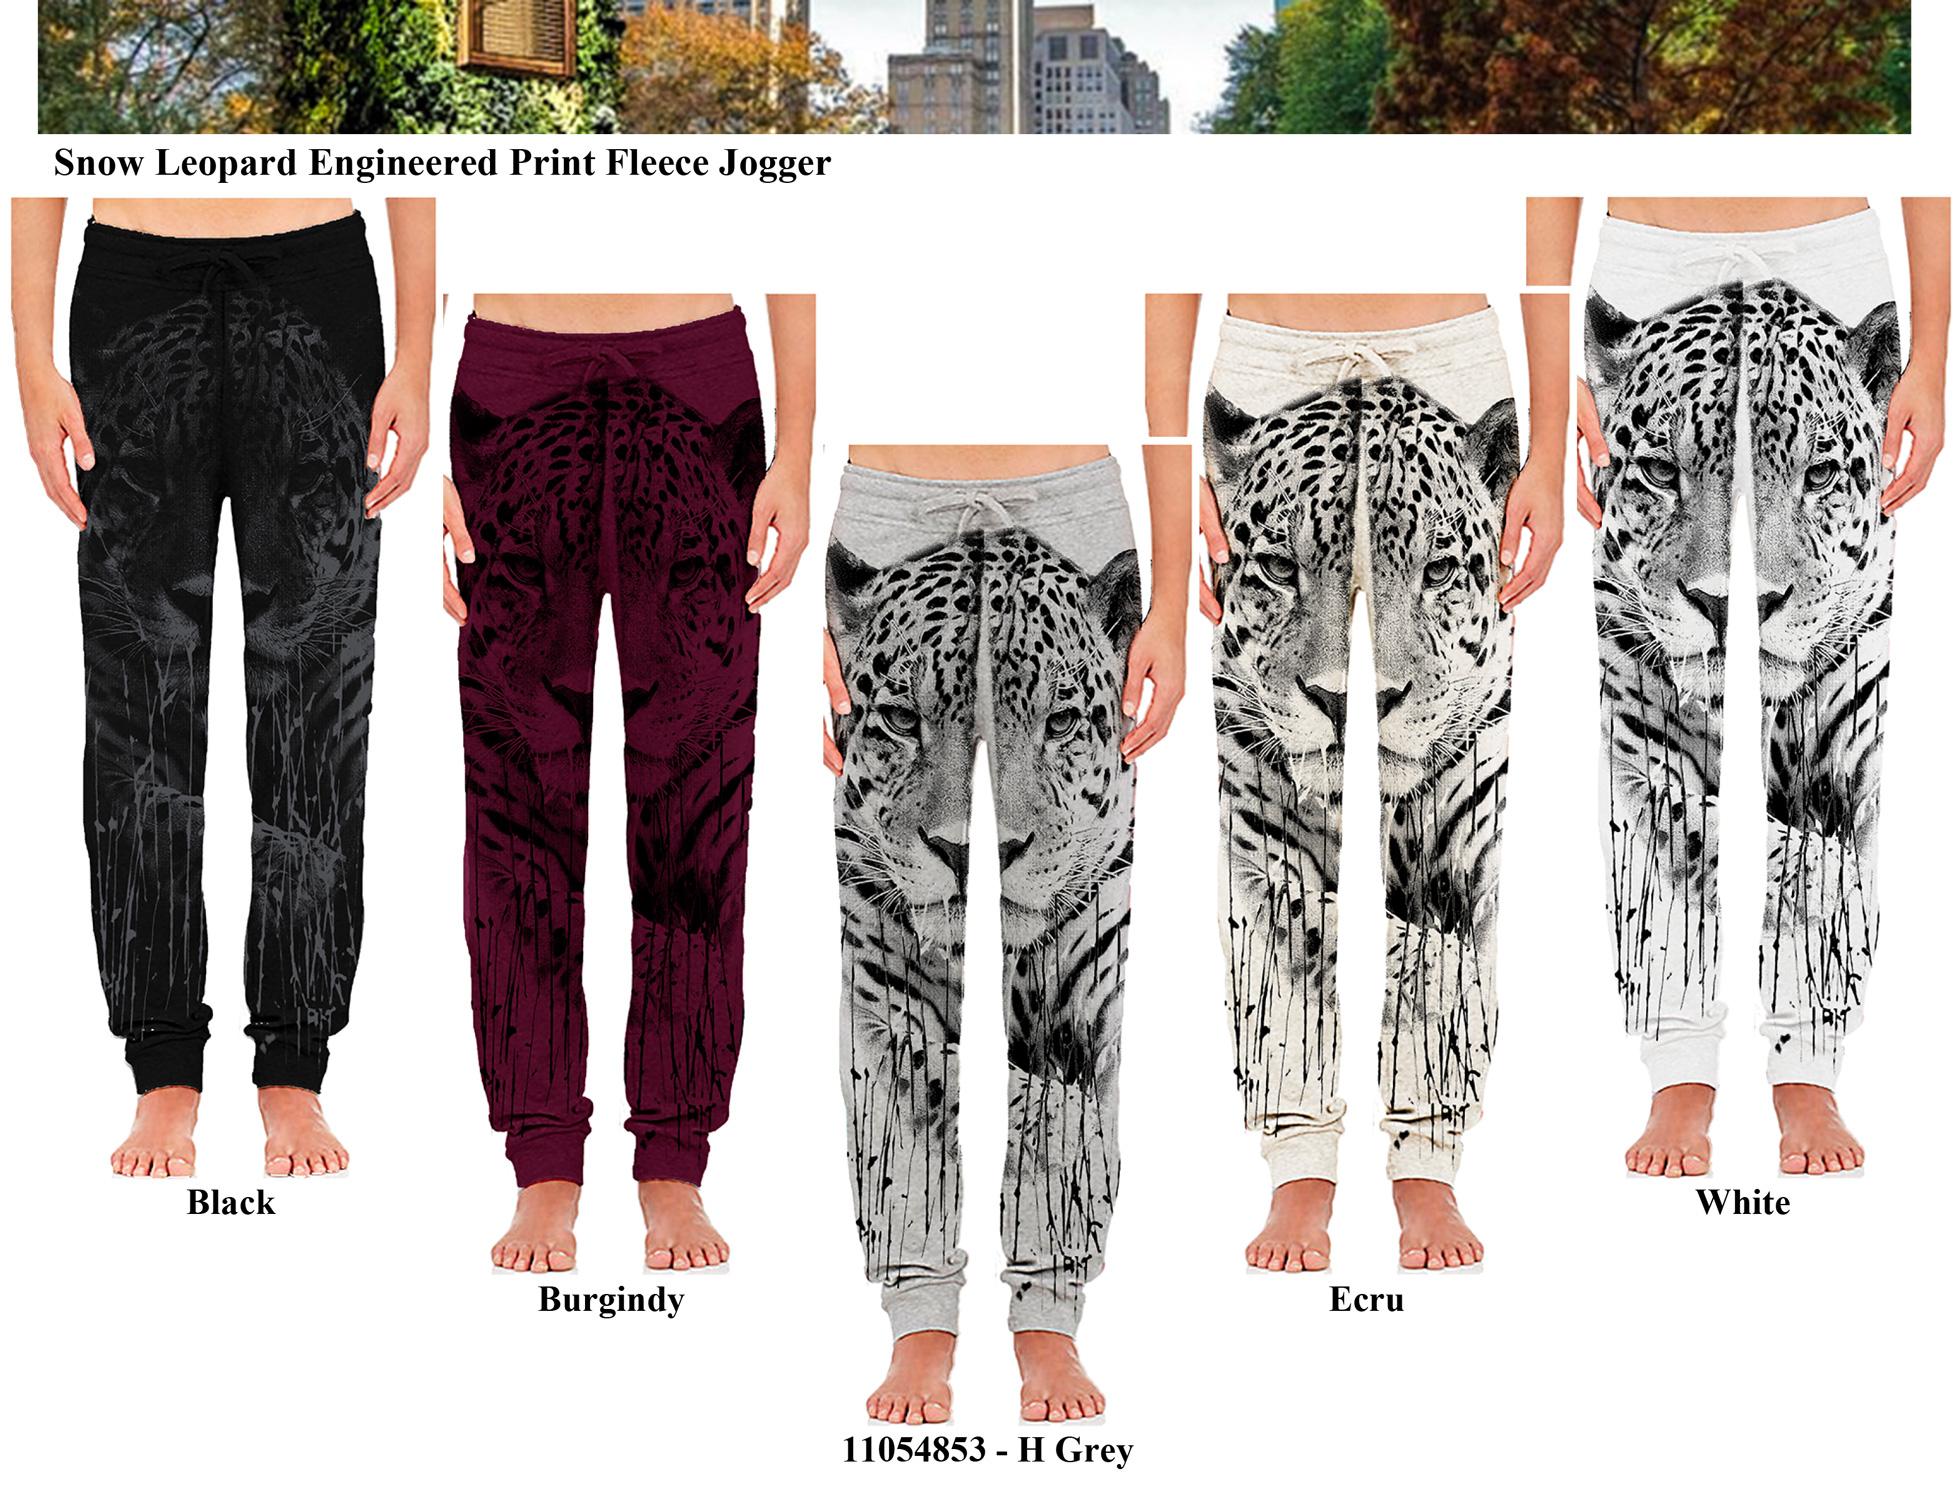 11054853-Snow-Leopard-Engineered-Print-Fleece-Jogger